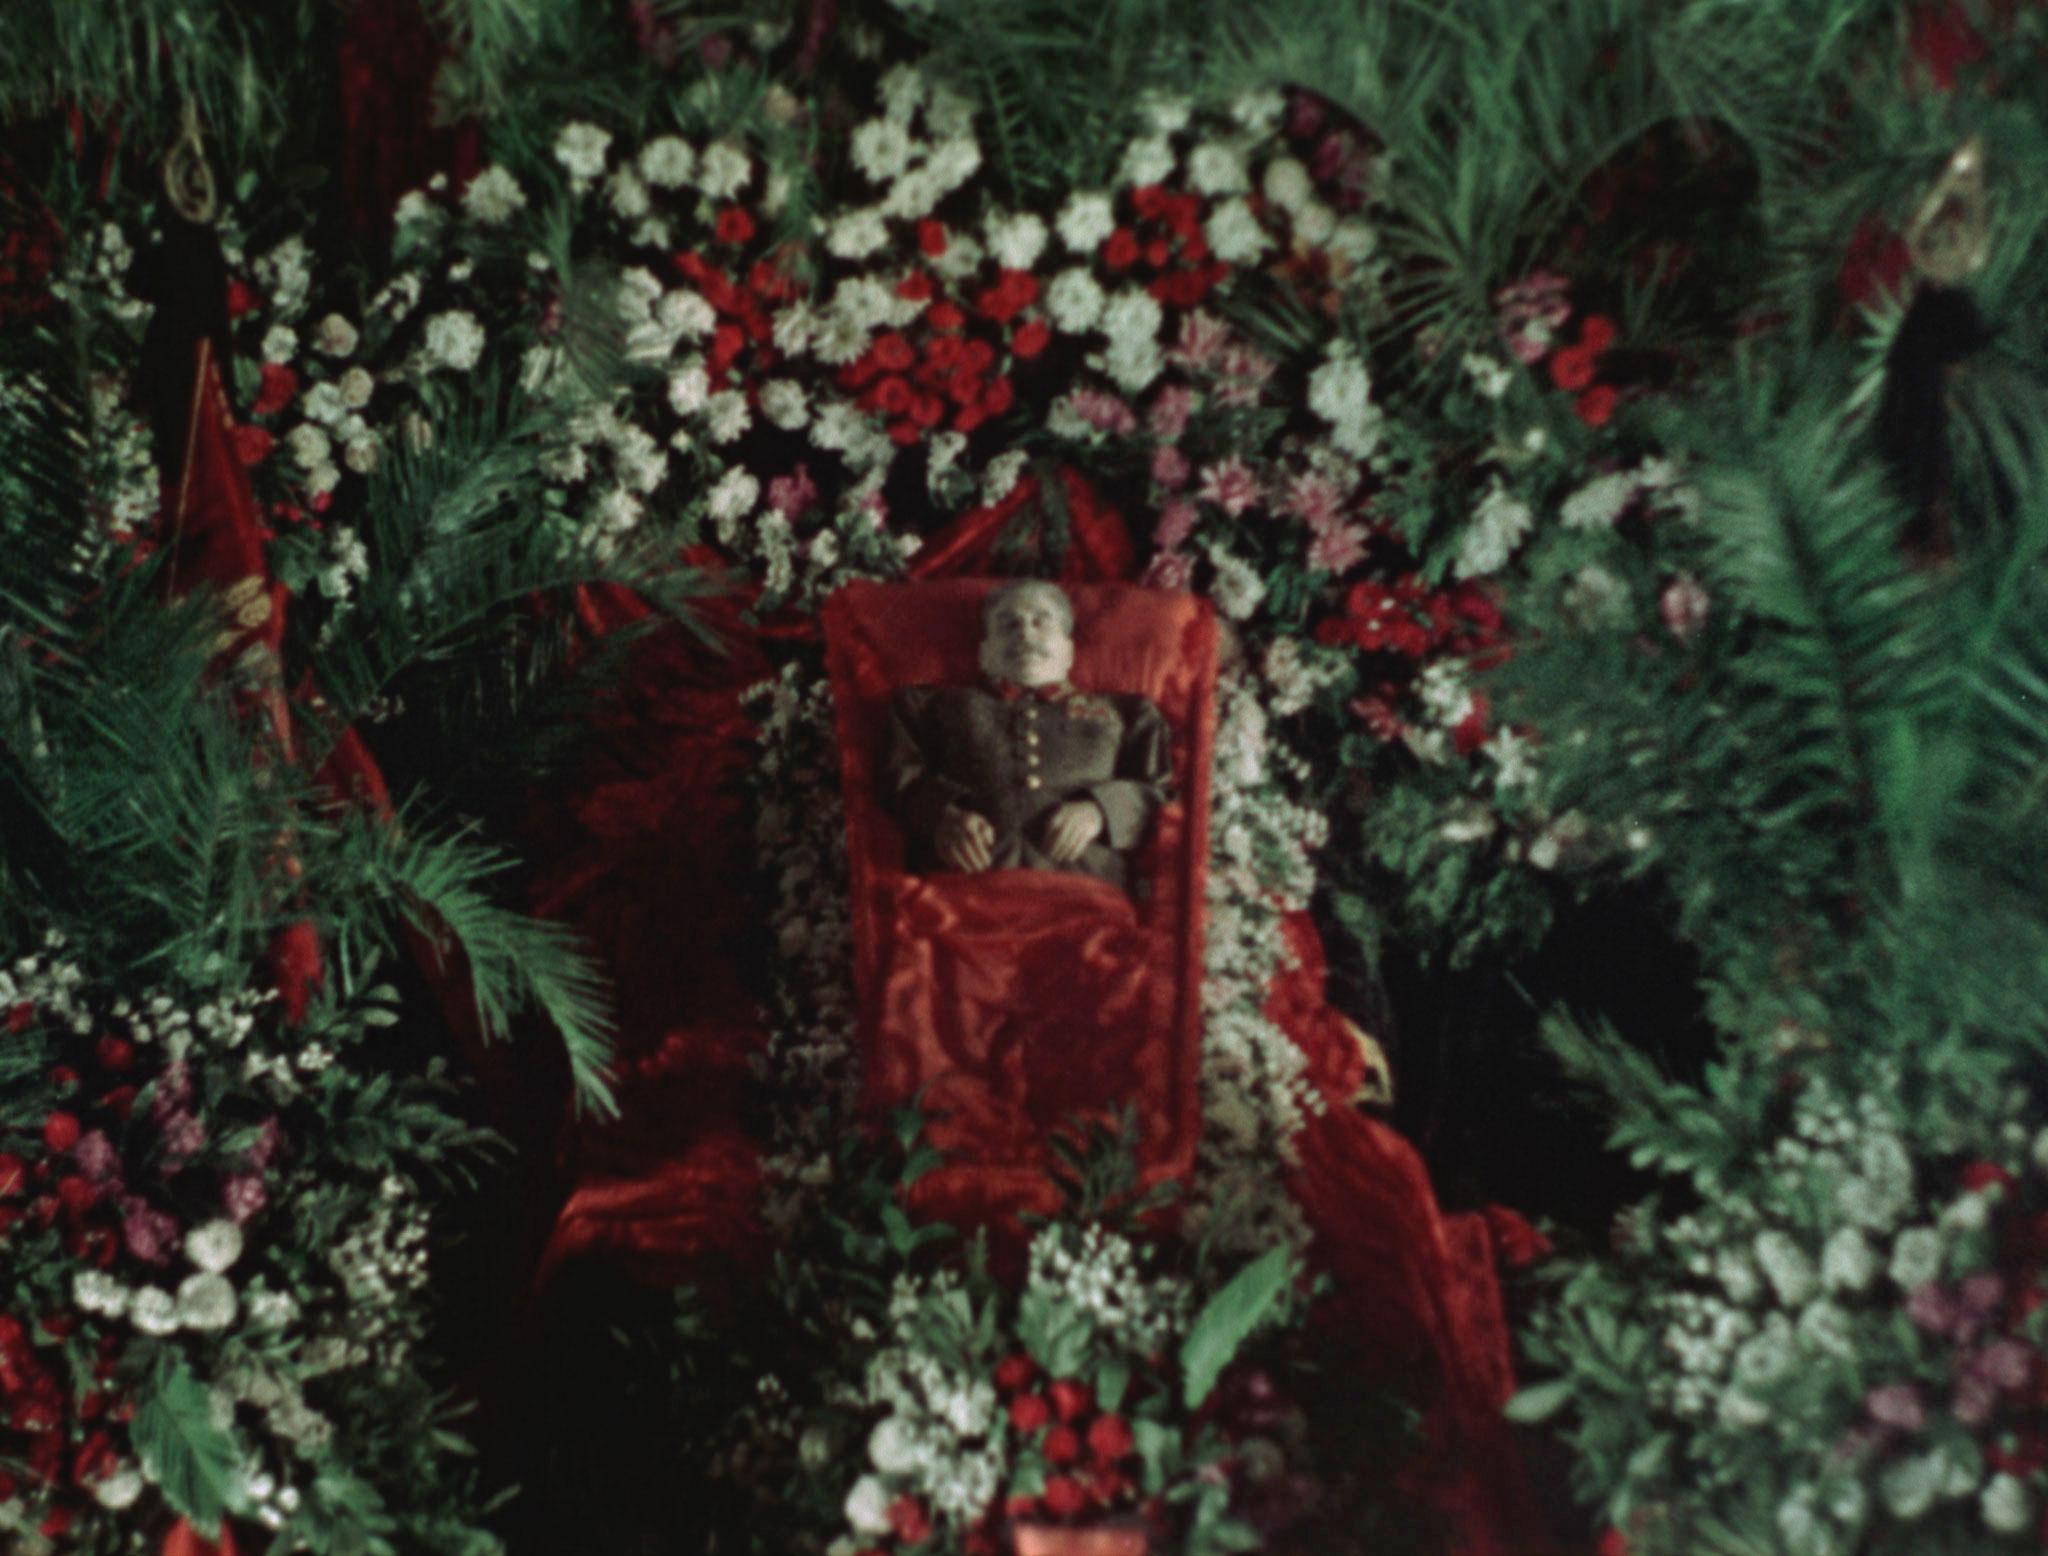 "<p>Фото © Документальный фильм ""Государственные похороны"" / <a href=""https://loznitsa.com/movie/state_funeral"" target=""_blank"" rel=""noopener noreferrer"">loznitsa.com</a></p>"